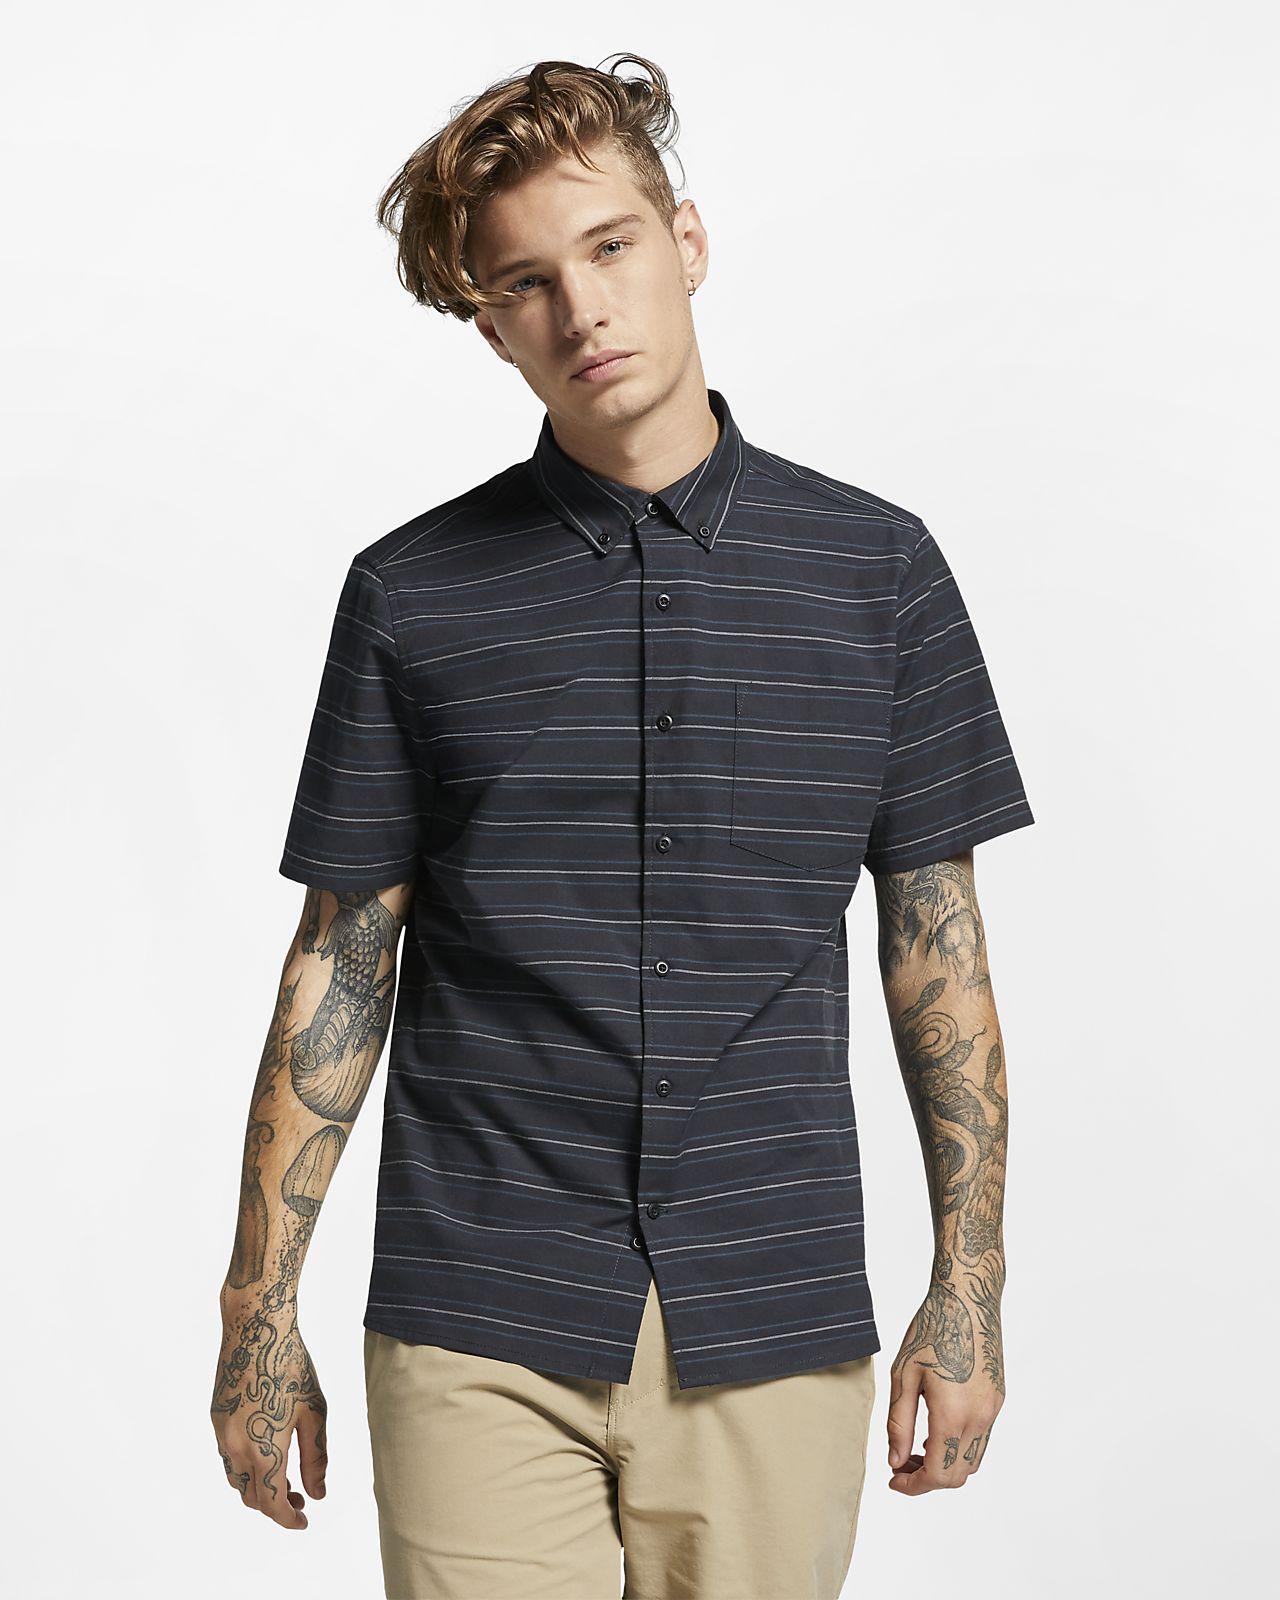 Hurley Dri-FIT Staycay Men's Short-Sleeve Shirt